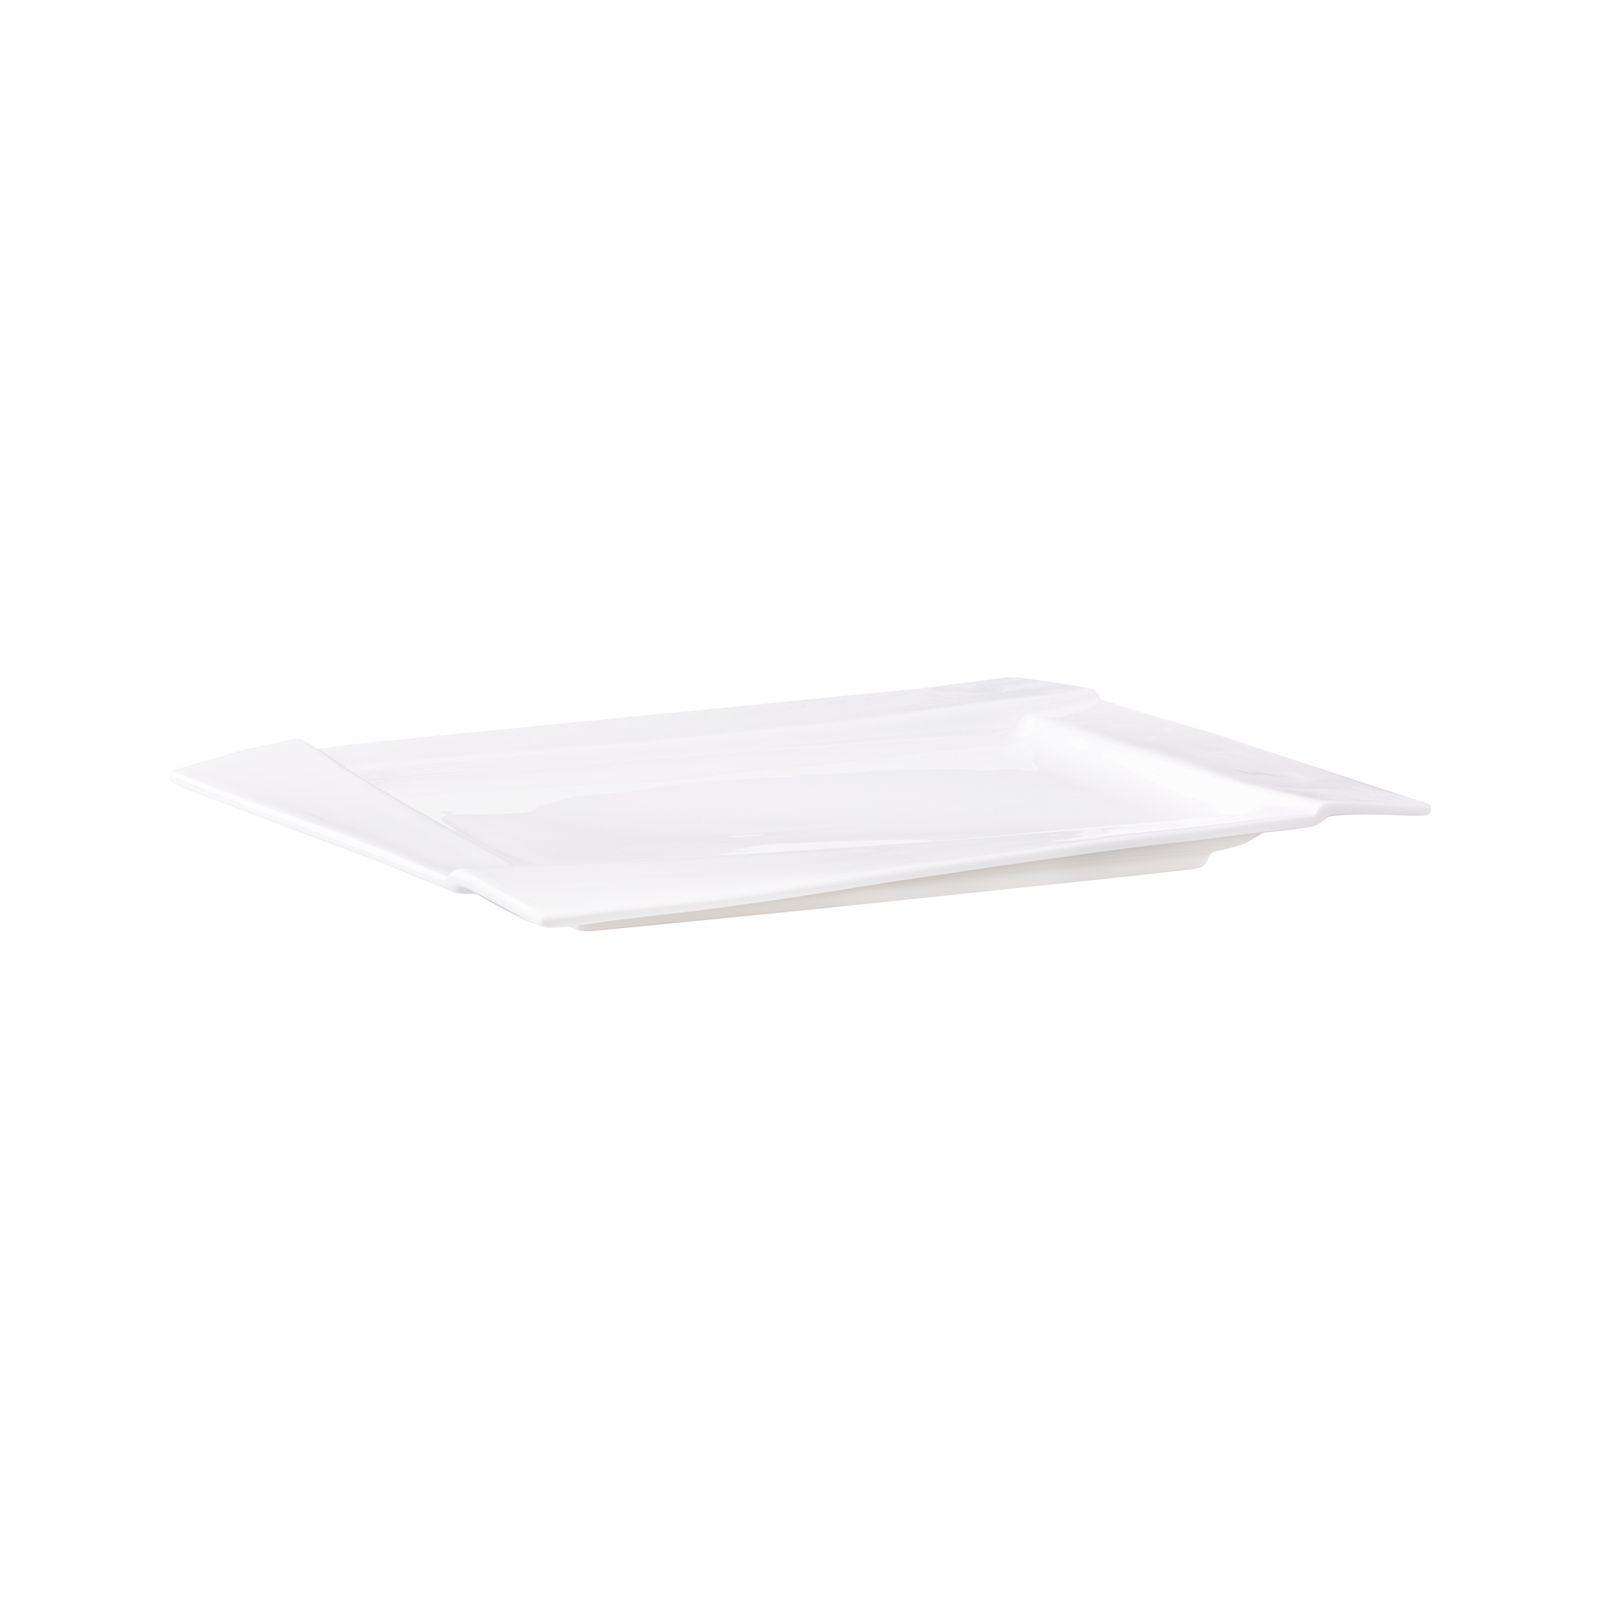 Rectangular platter serving dish Kubiko 35,5 x 25 cm AMBITION